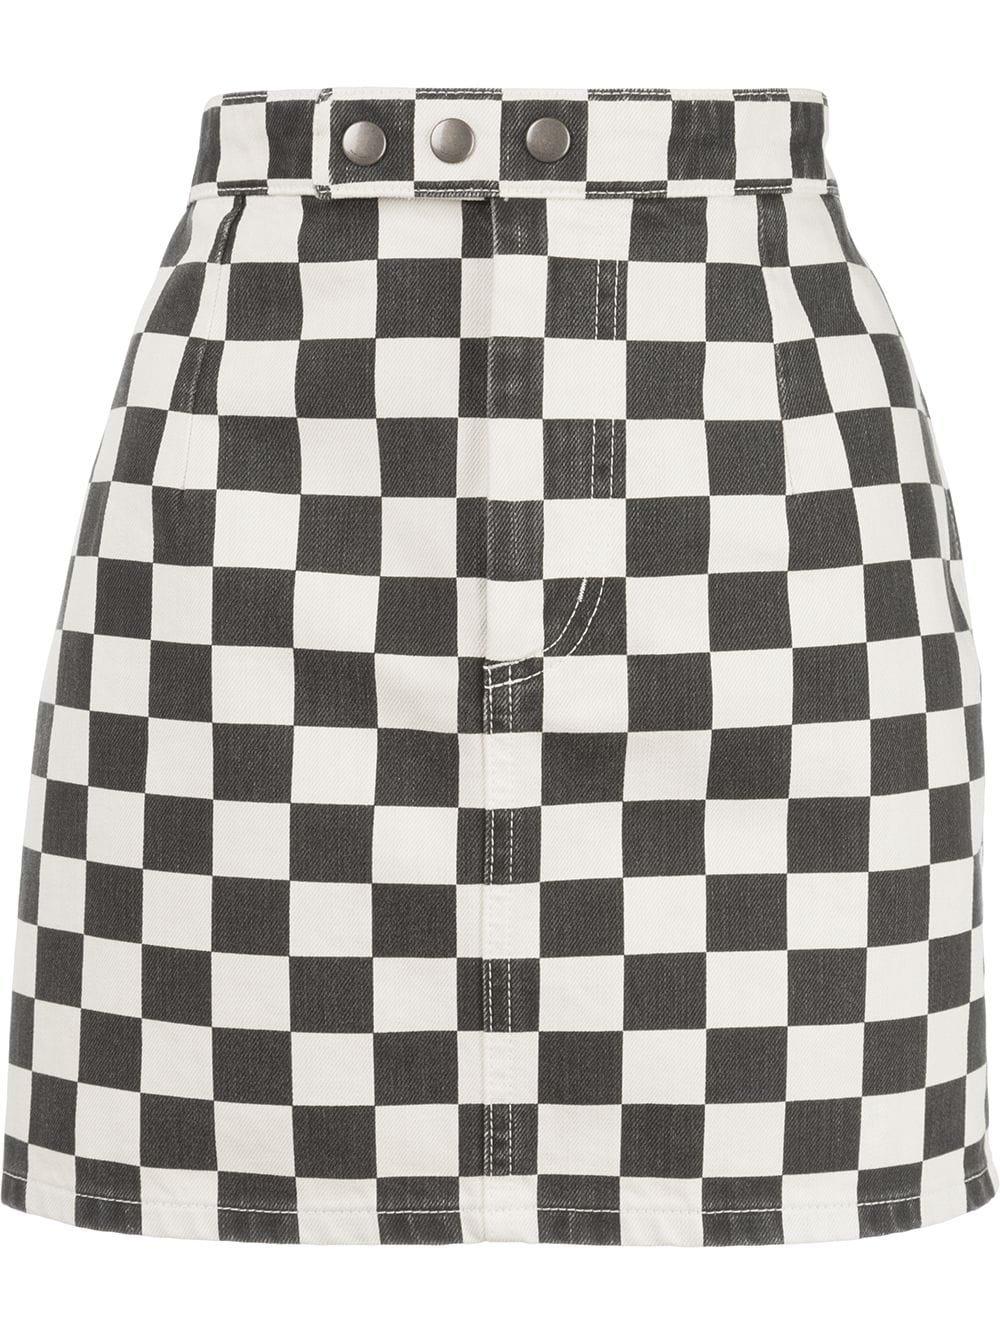 Saint Laurent Checkerboard Mini Skirt - Farfetch